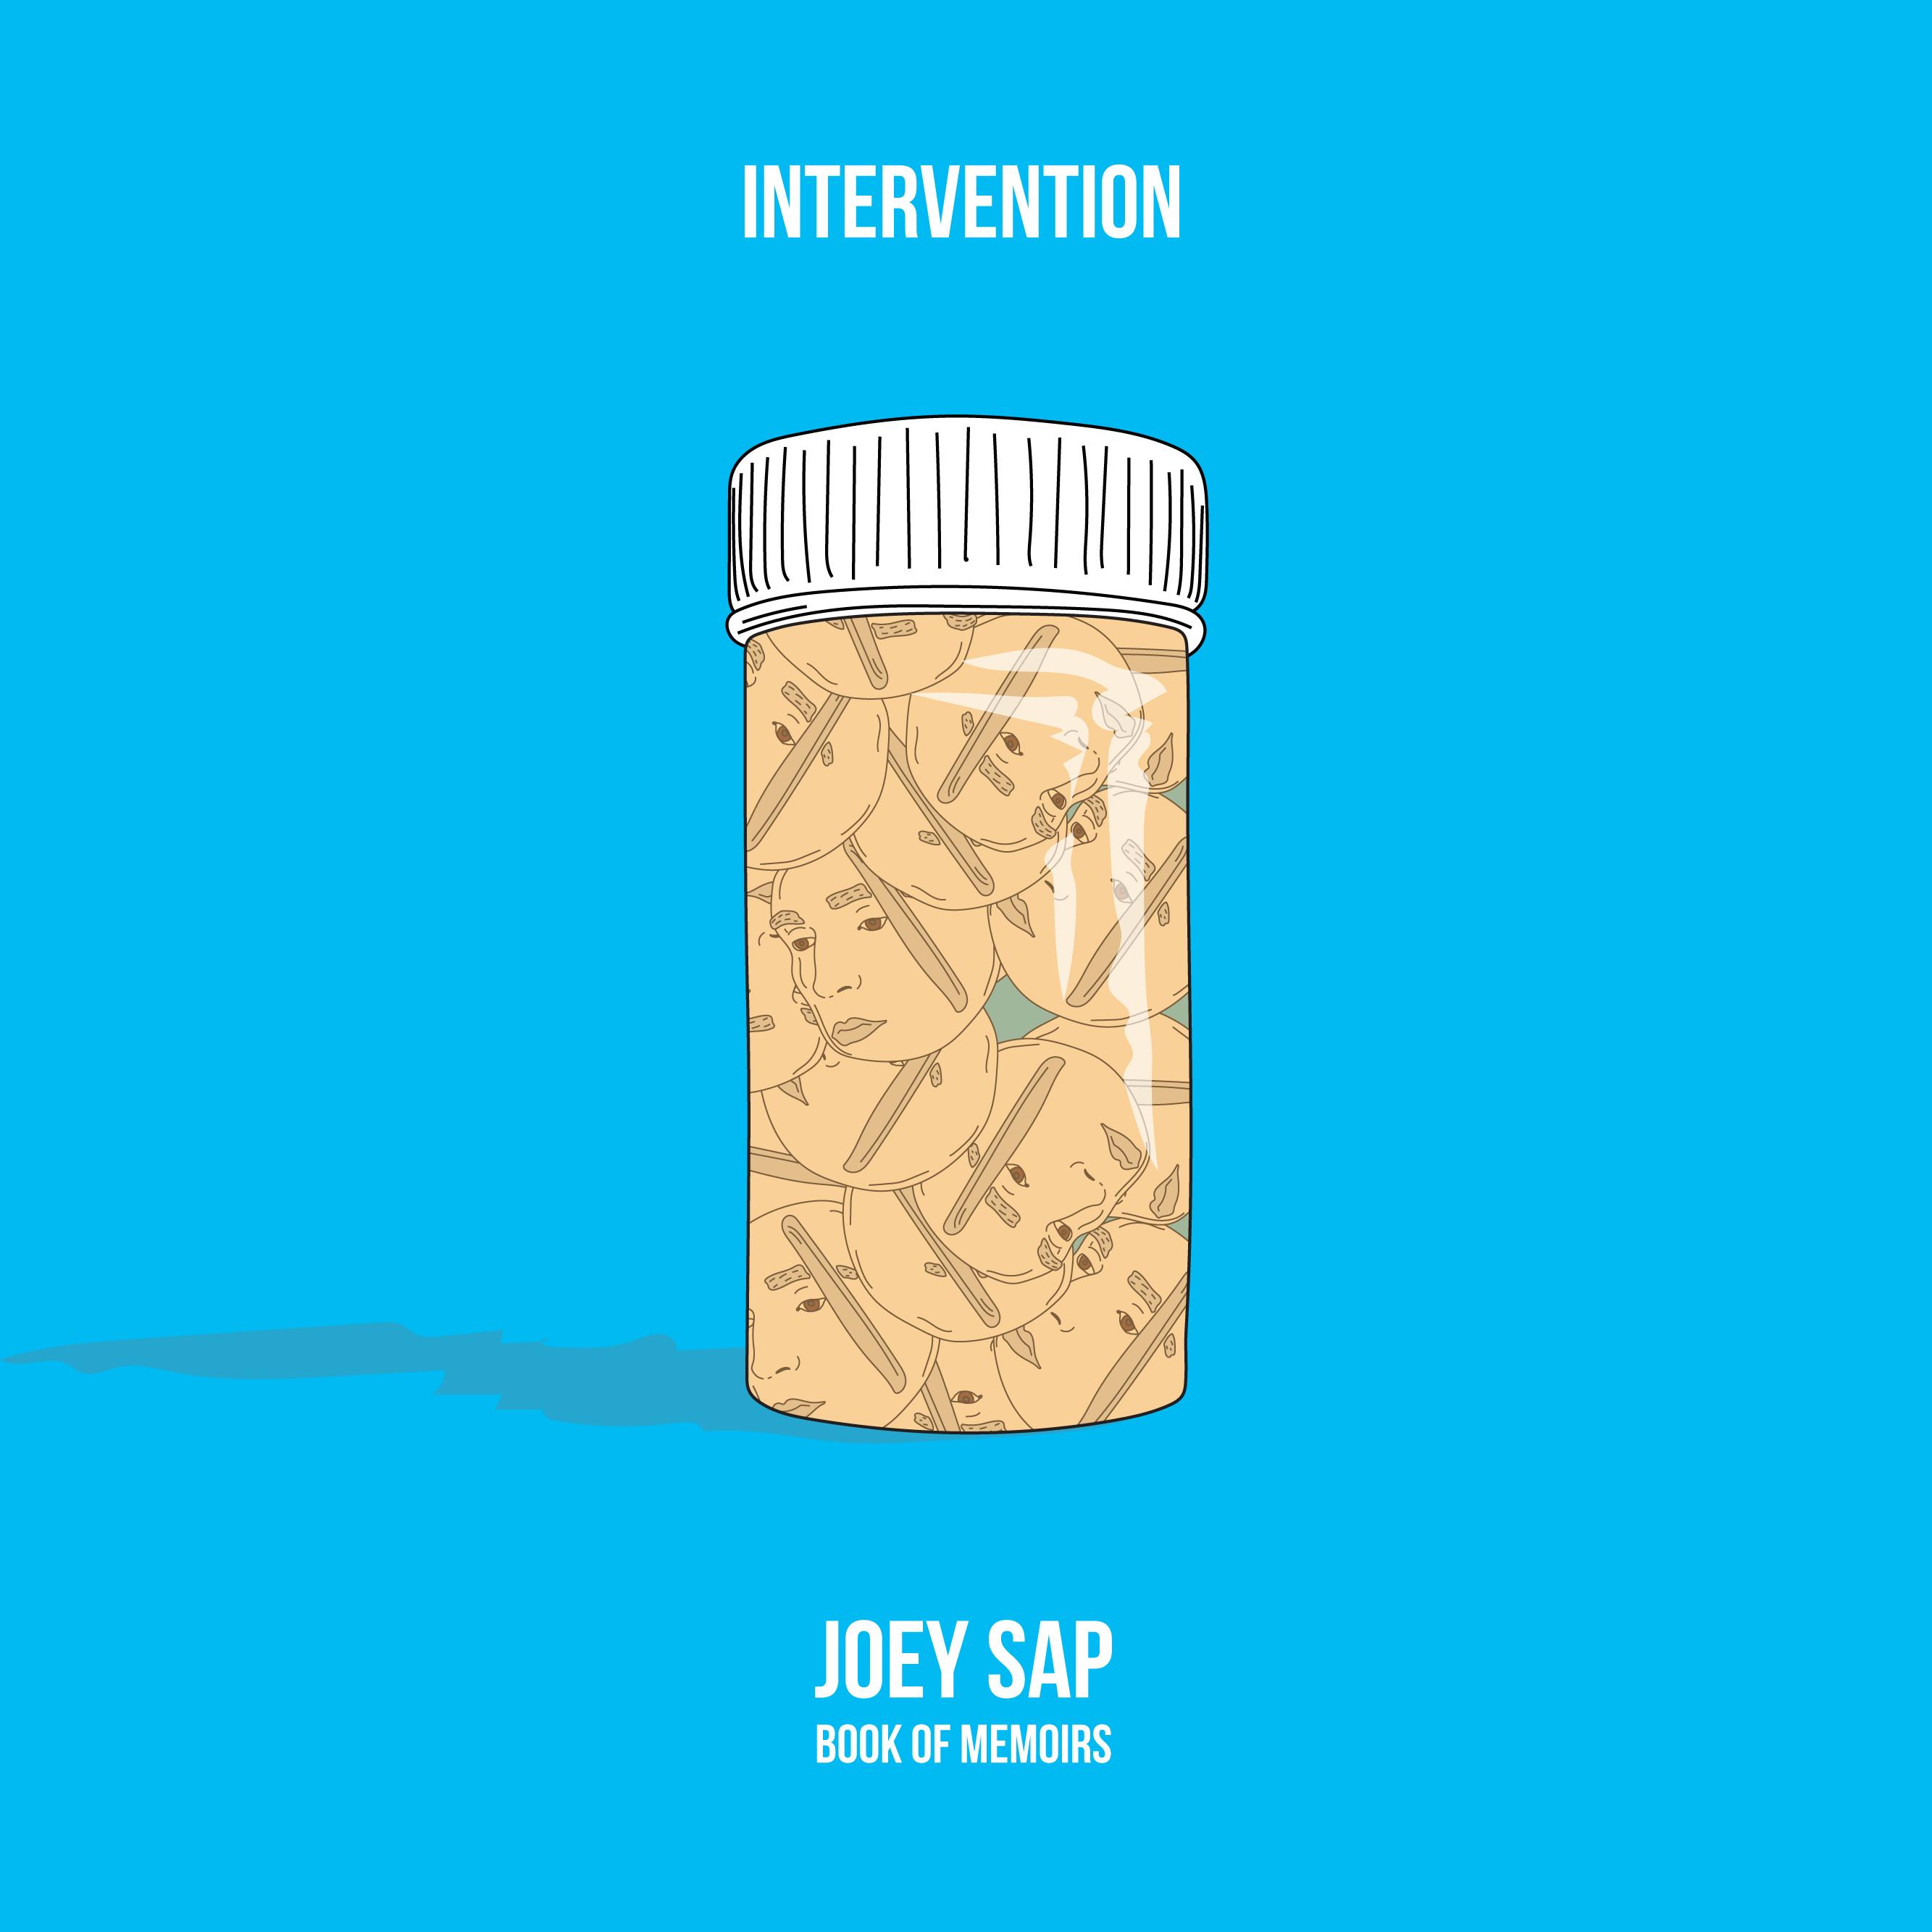 intervention mixtape2-01